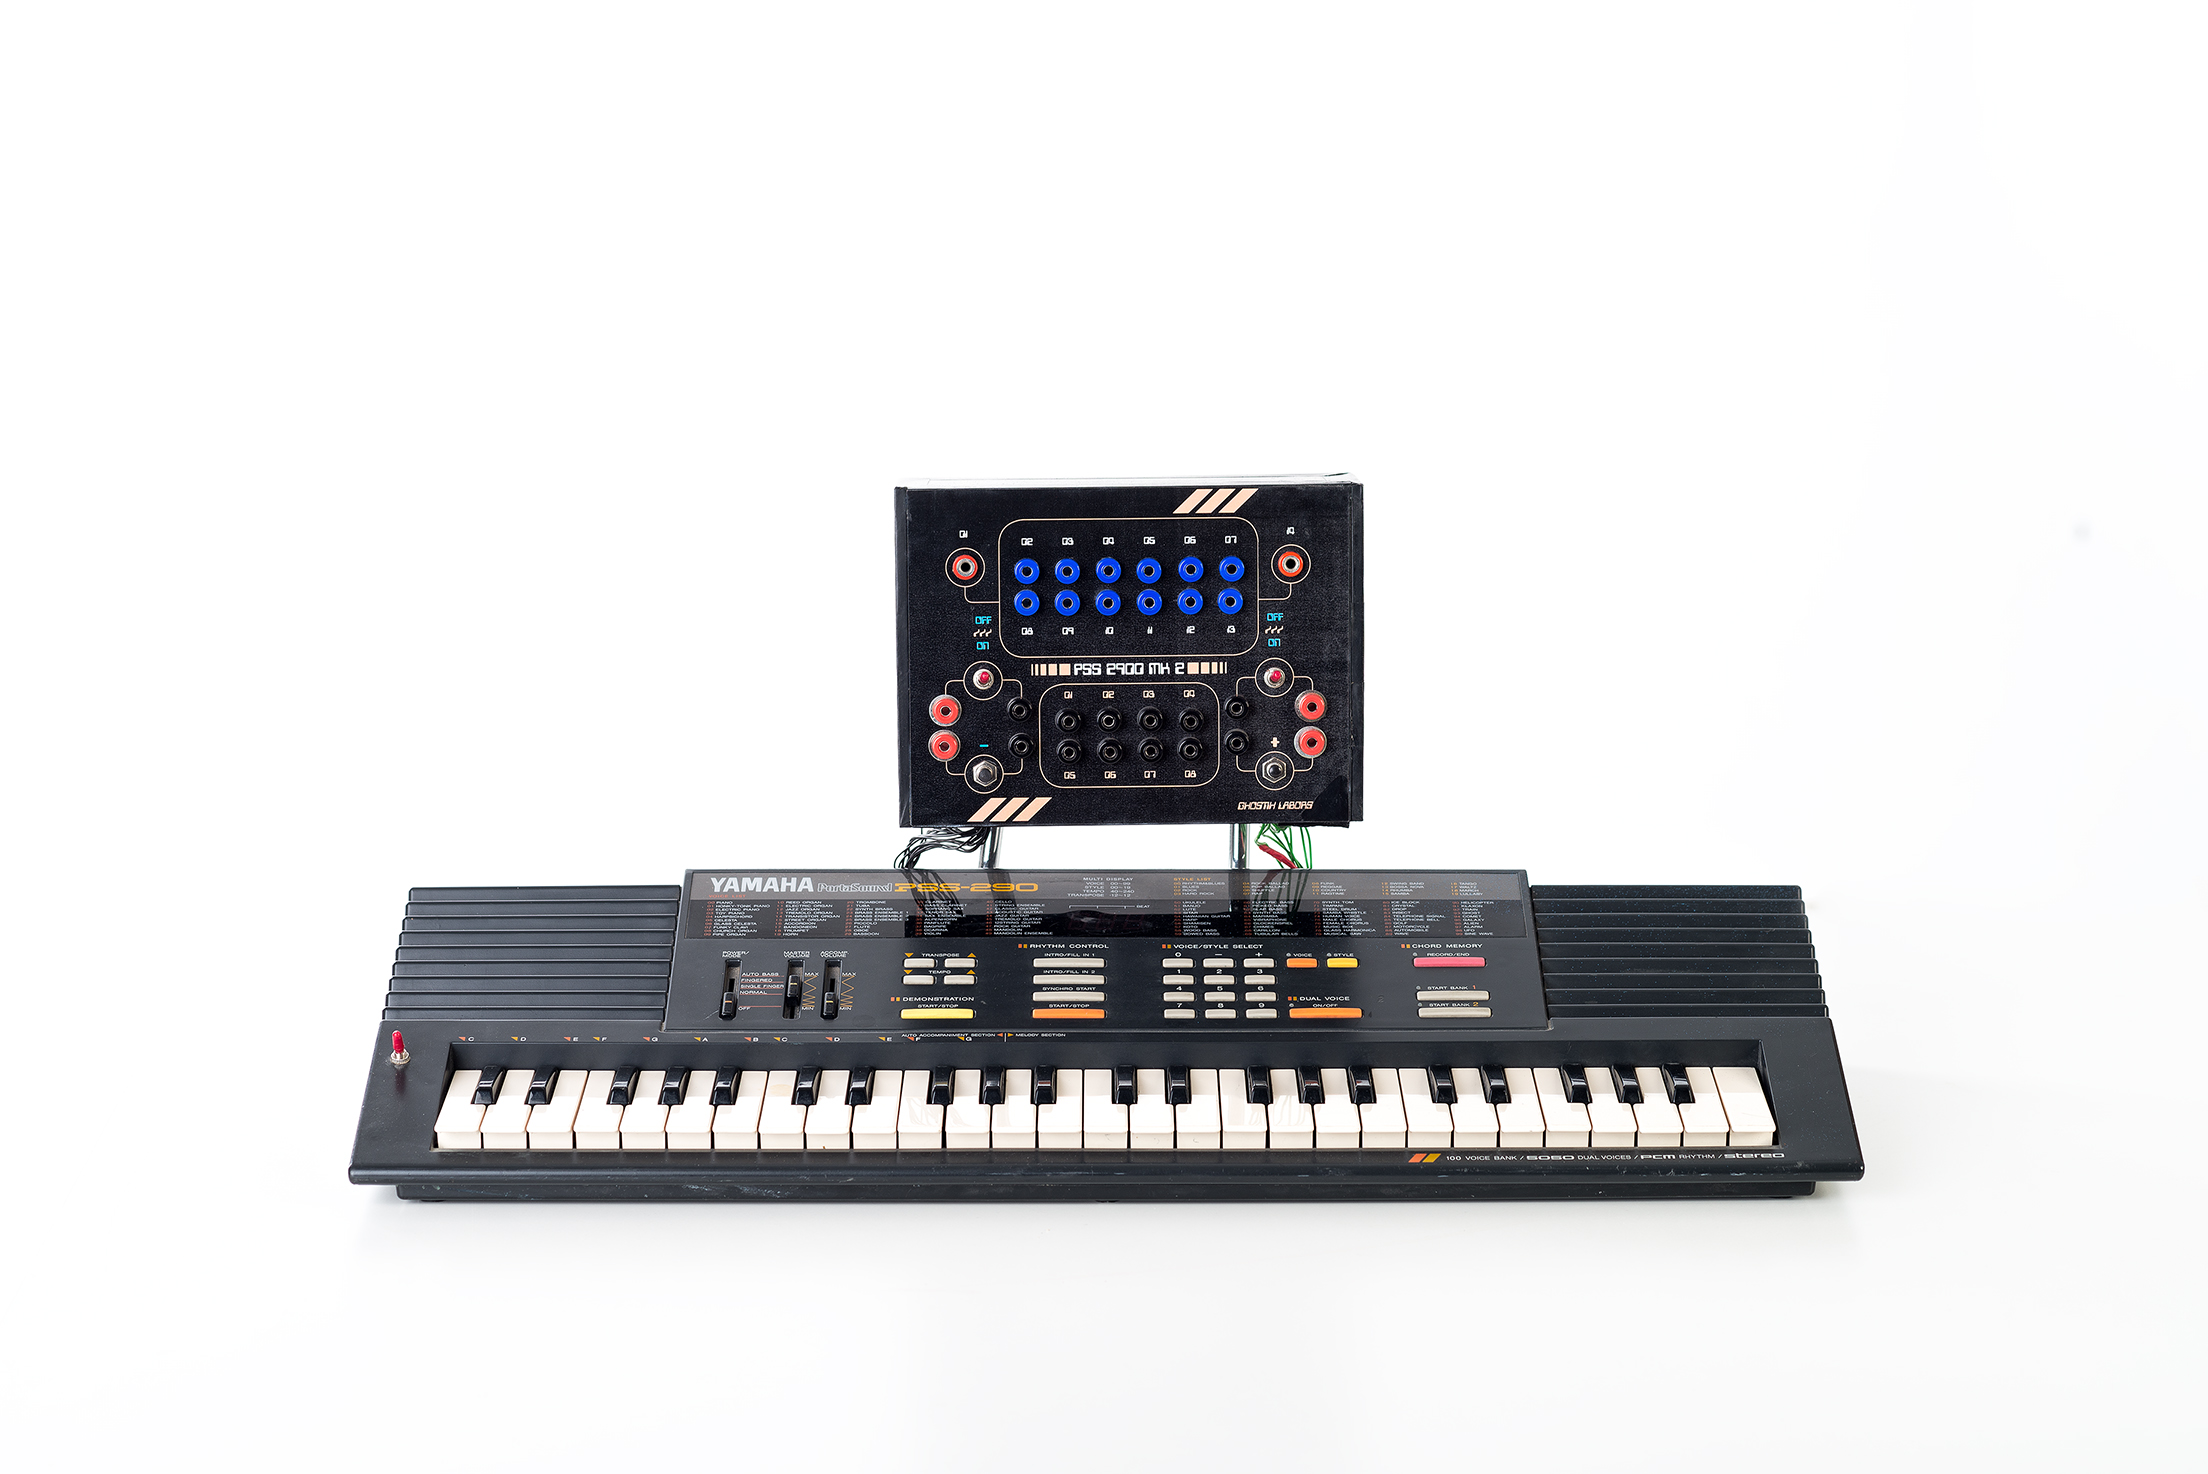 PSS 2900 MK2